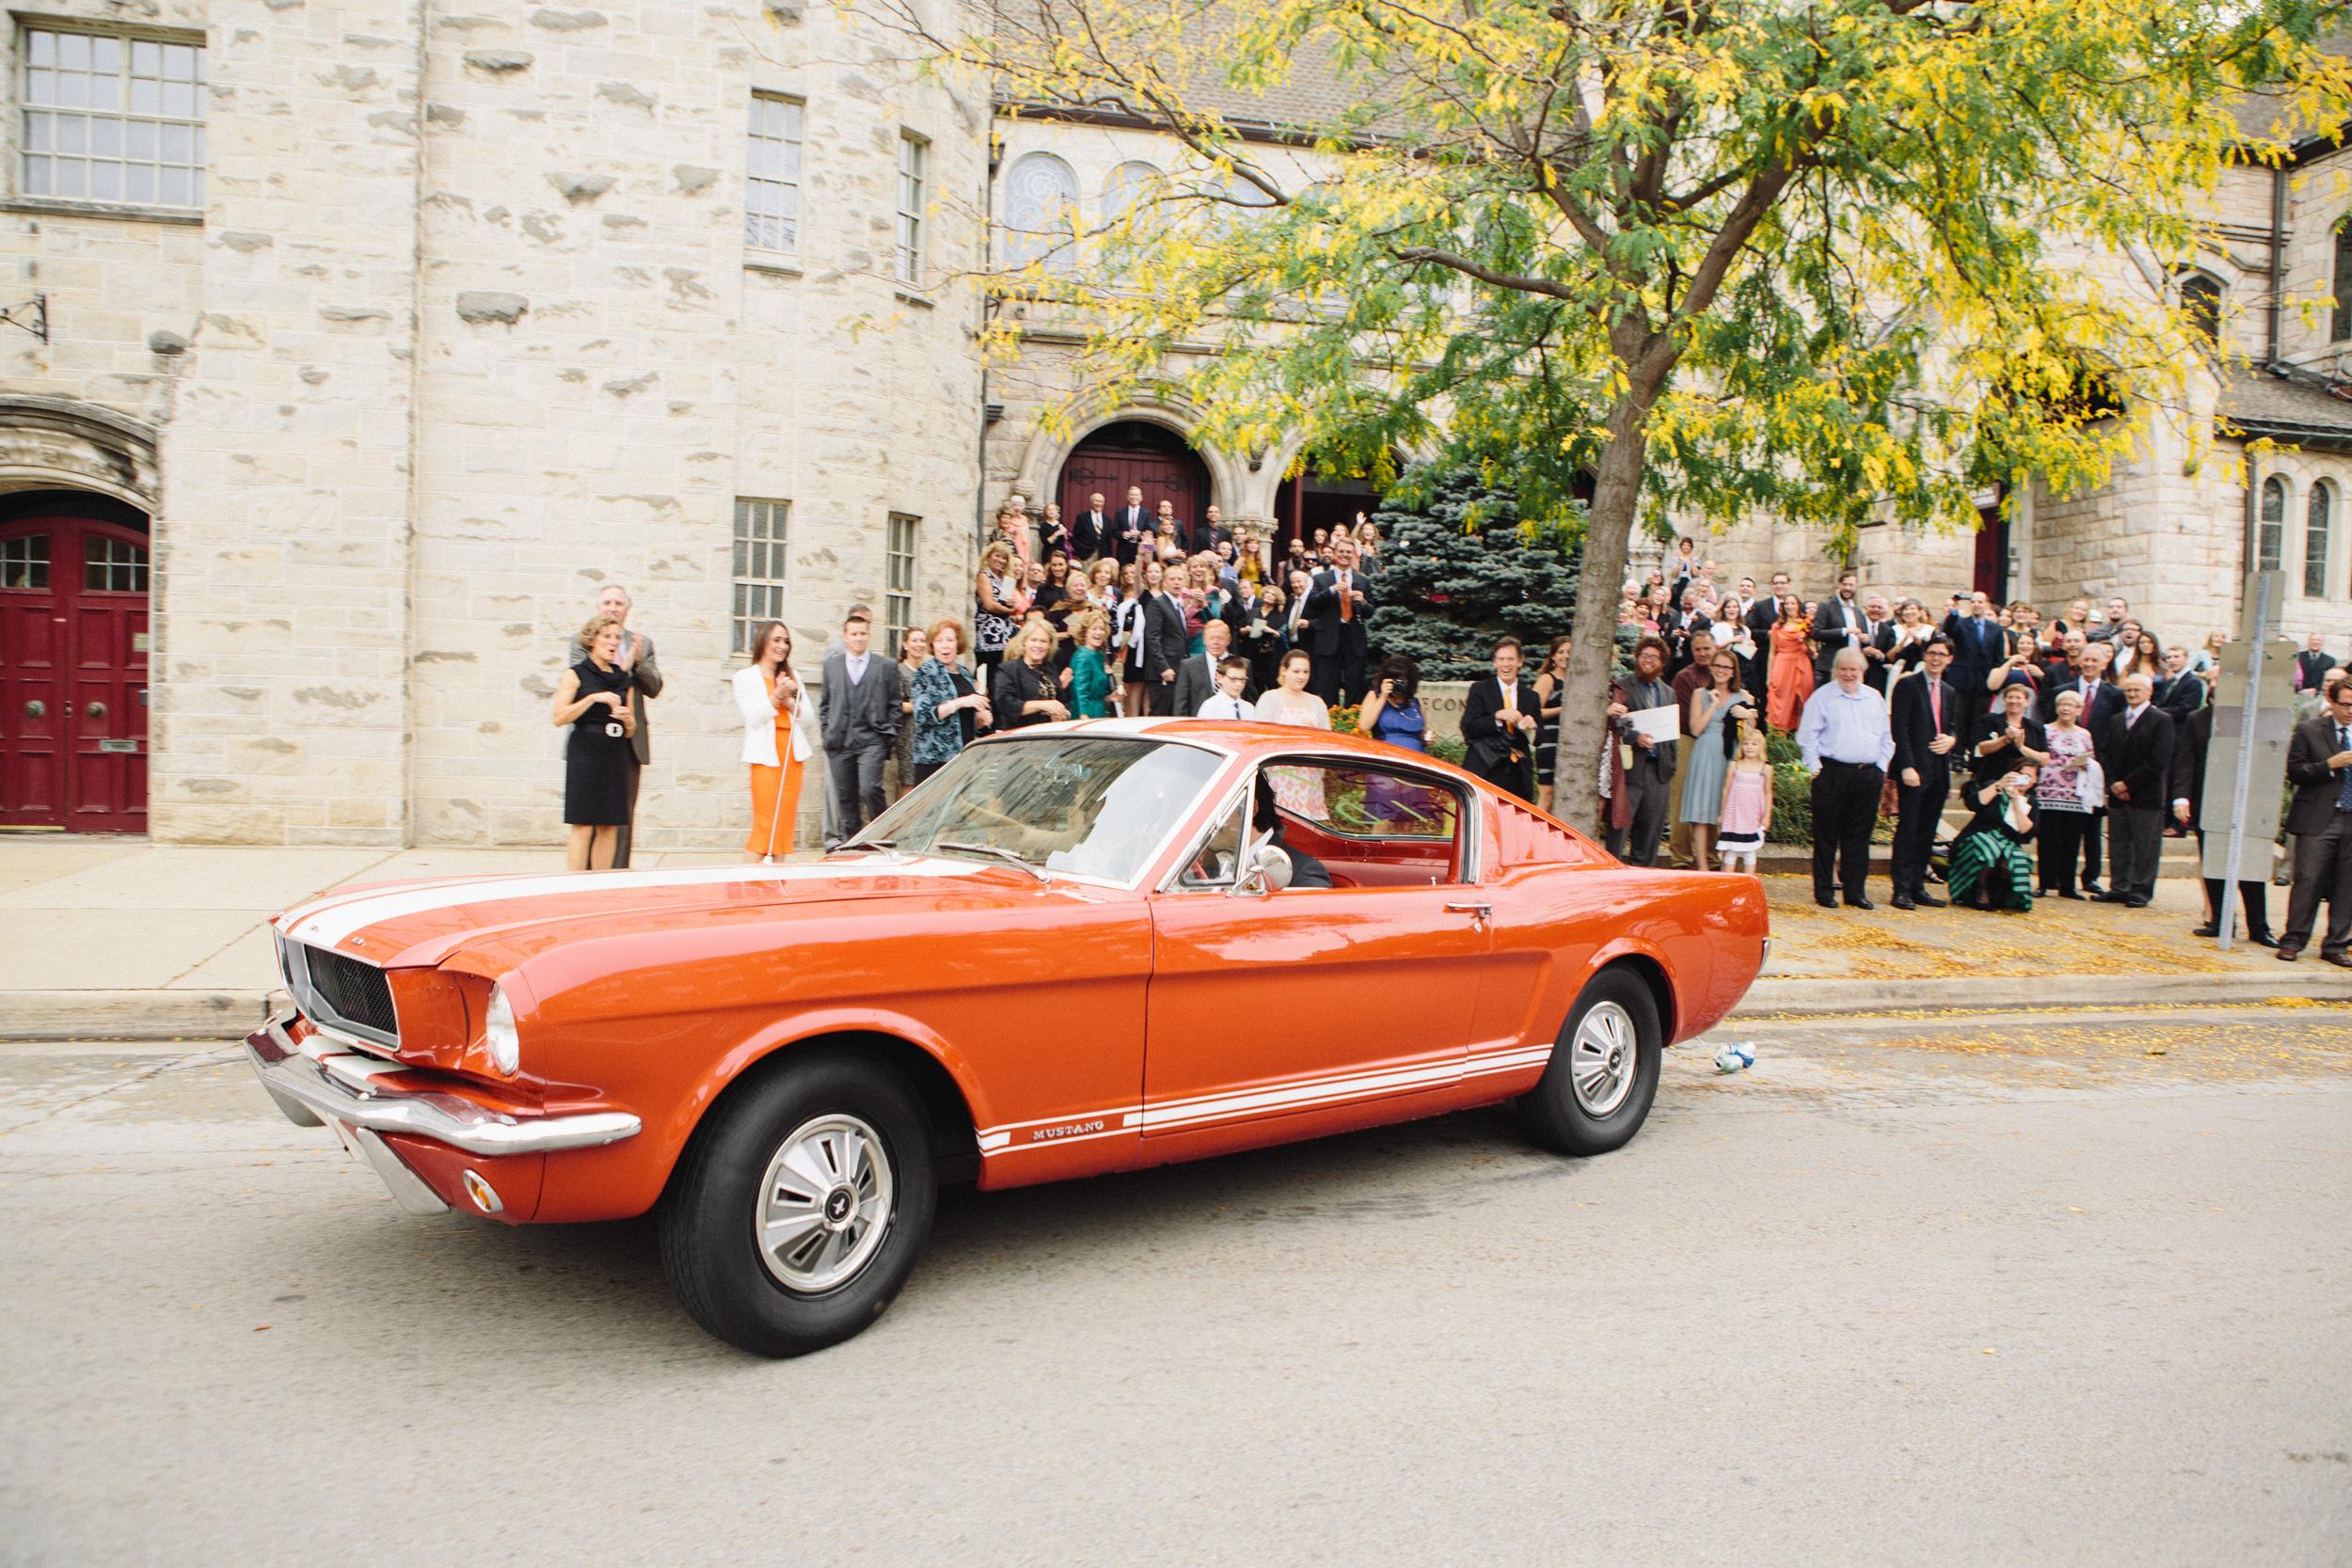 10-05-2013 maggie & adam wedding photography by brian milo-143.jpg